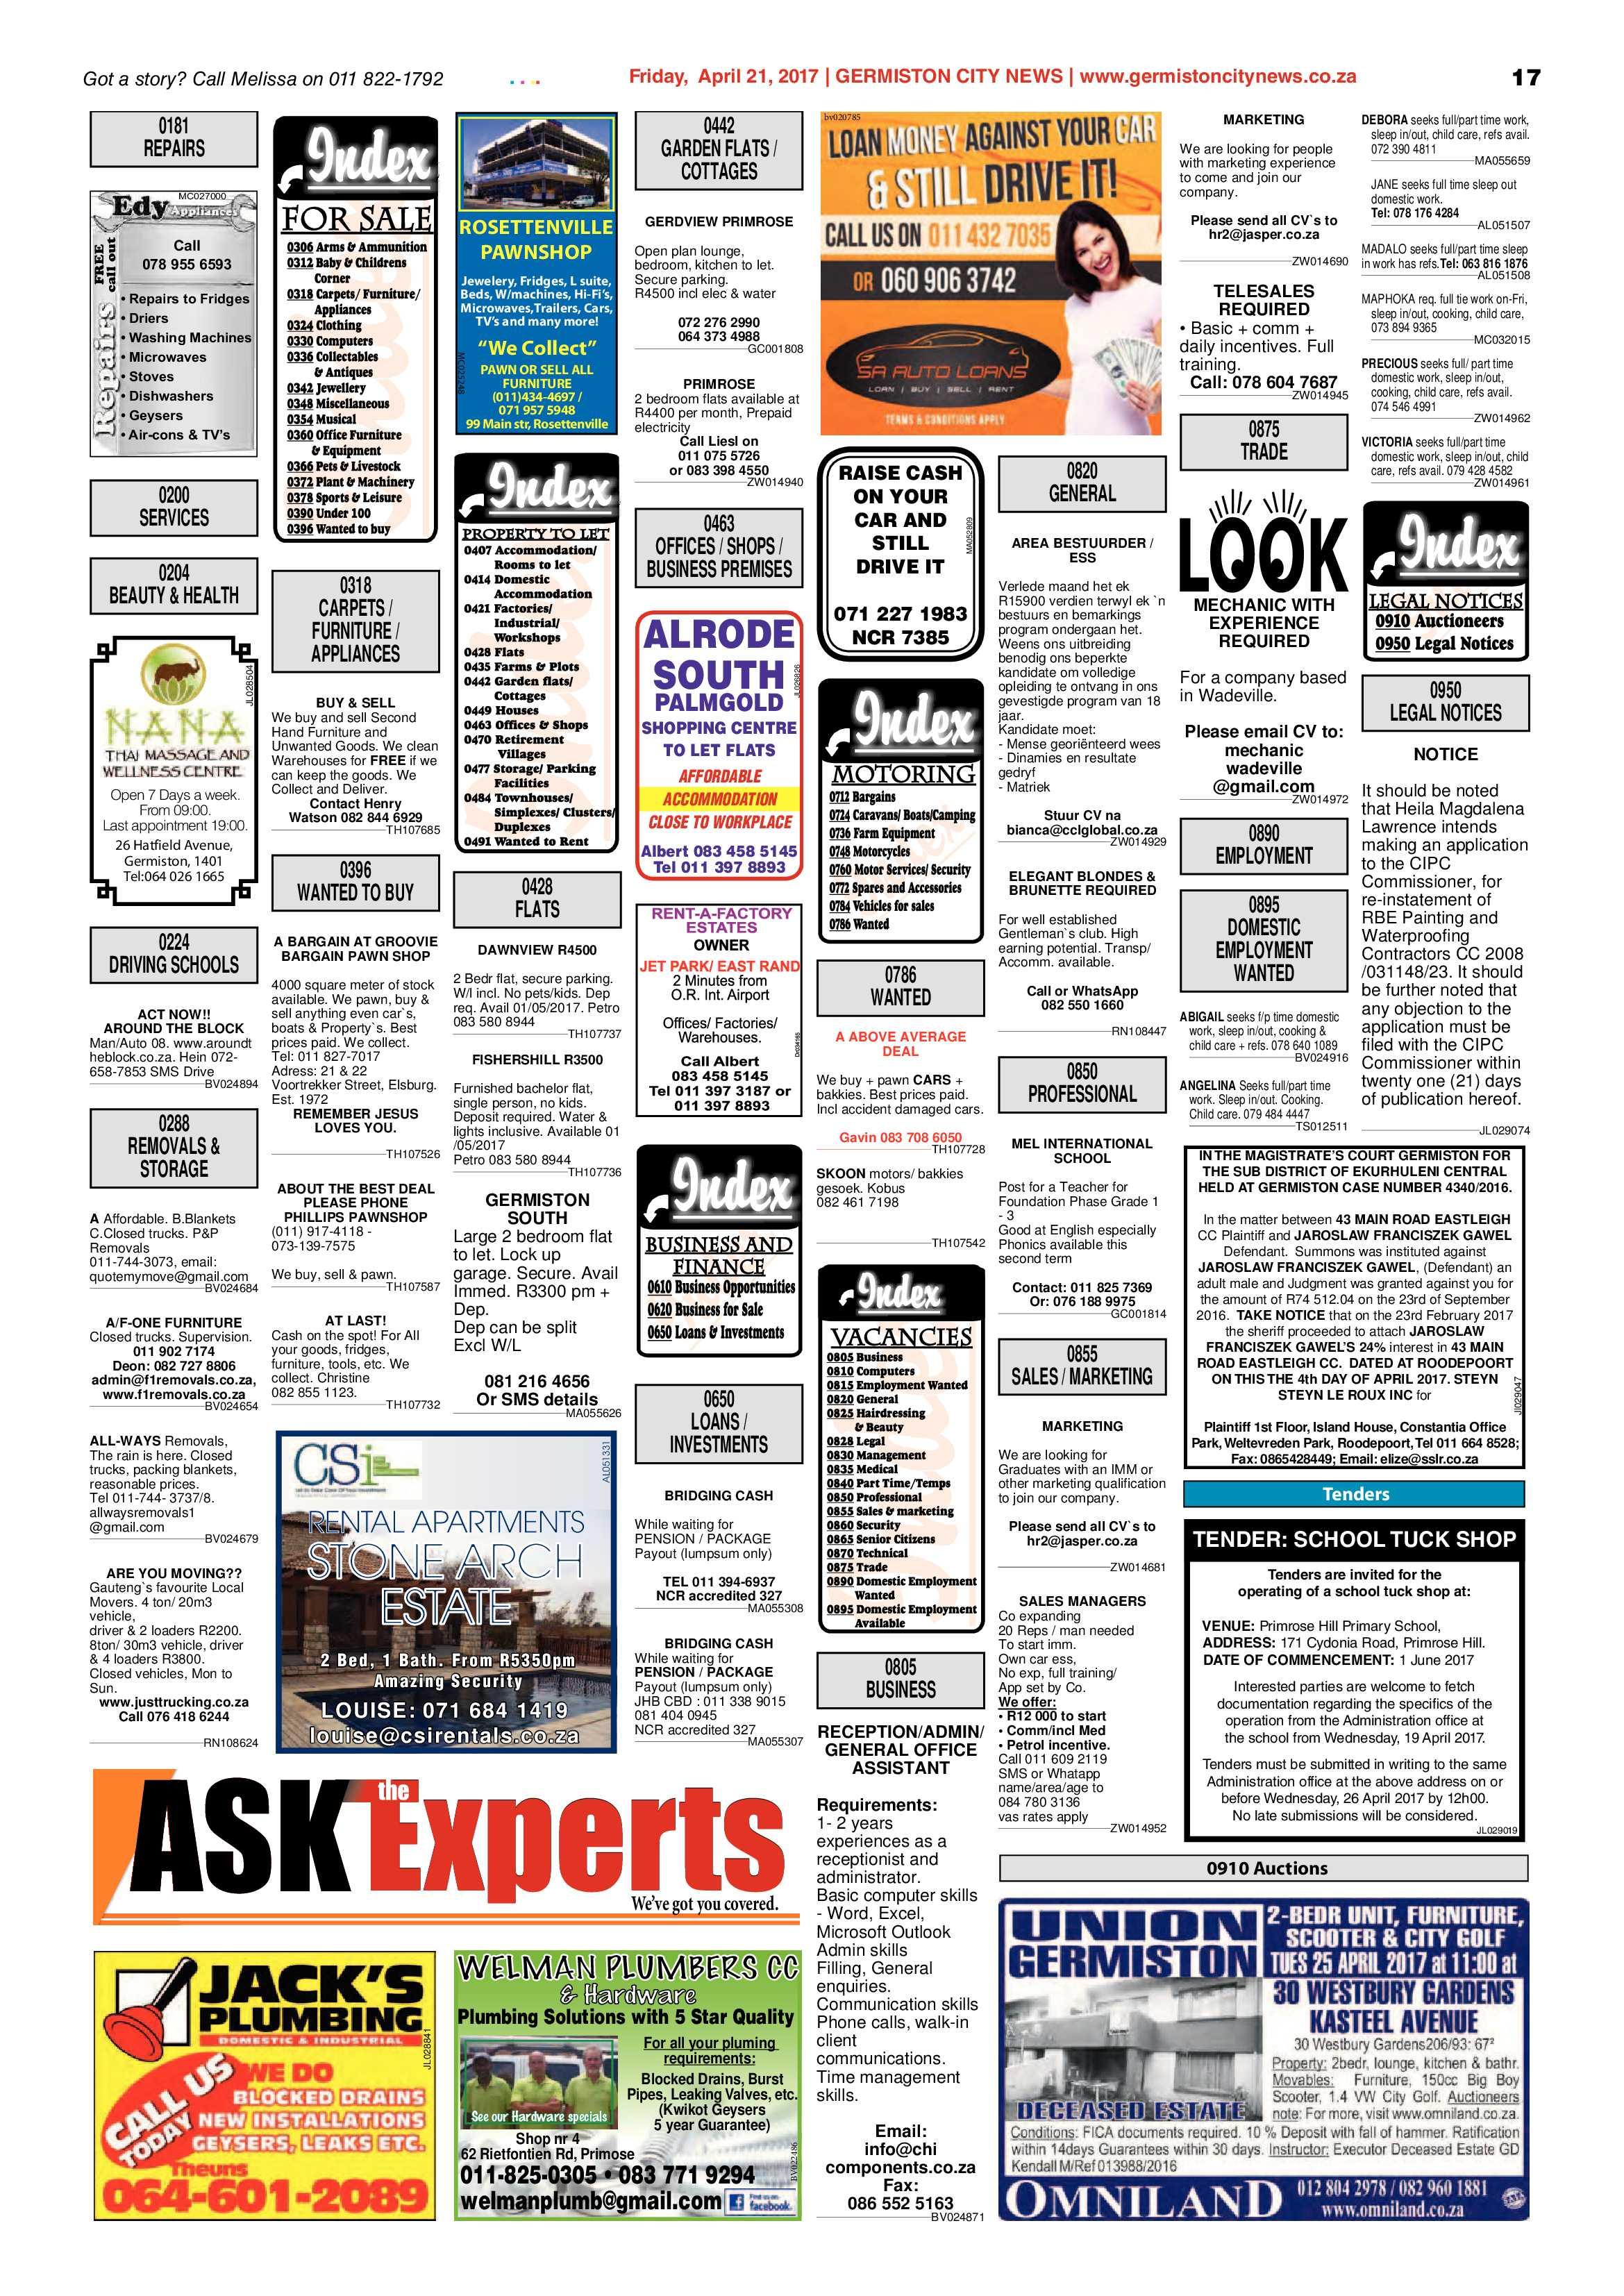 germiston-city-news-19-april-2017-epapers-page-17